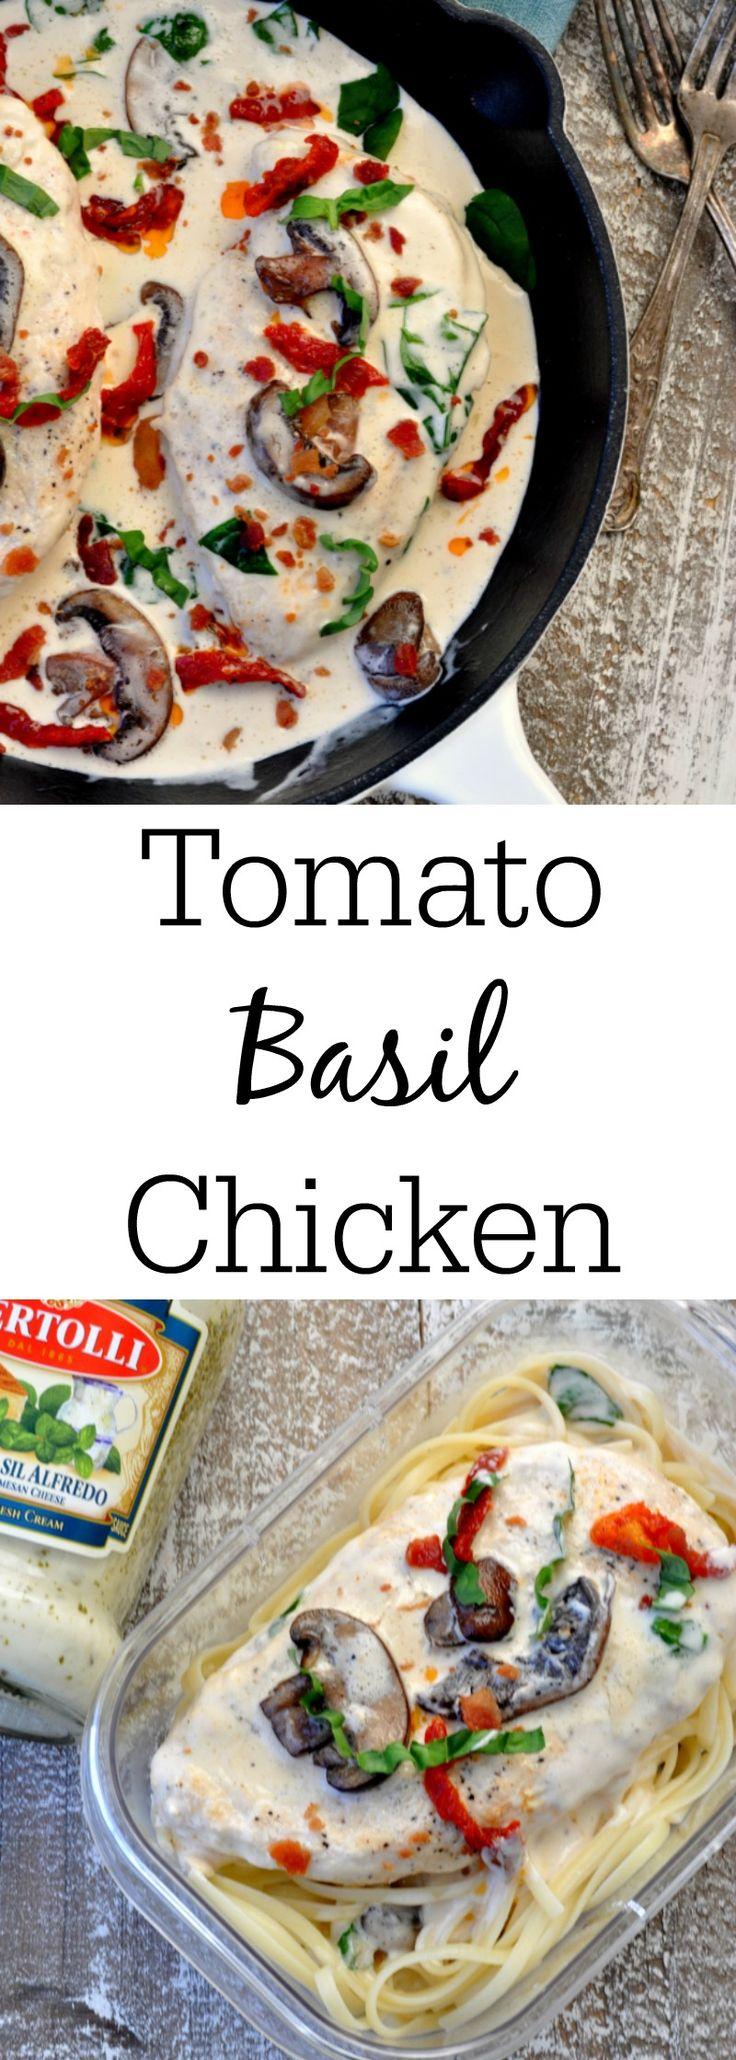 Tomato Basil Chicken Skillet #PremiumPrep #ad